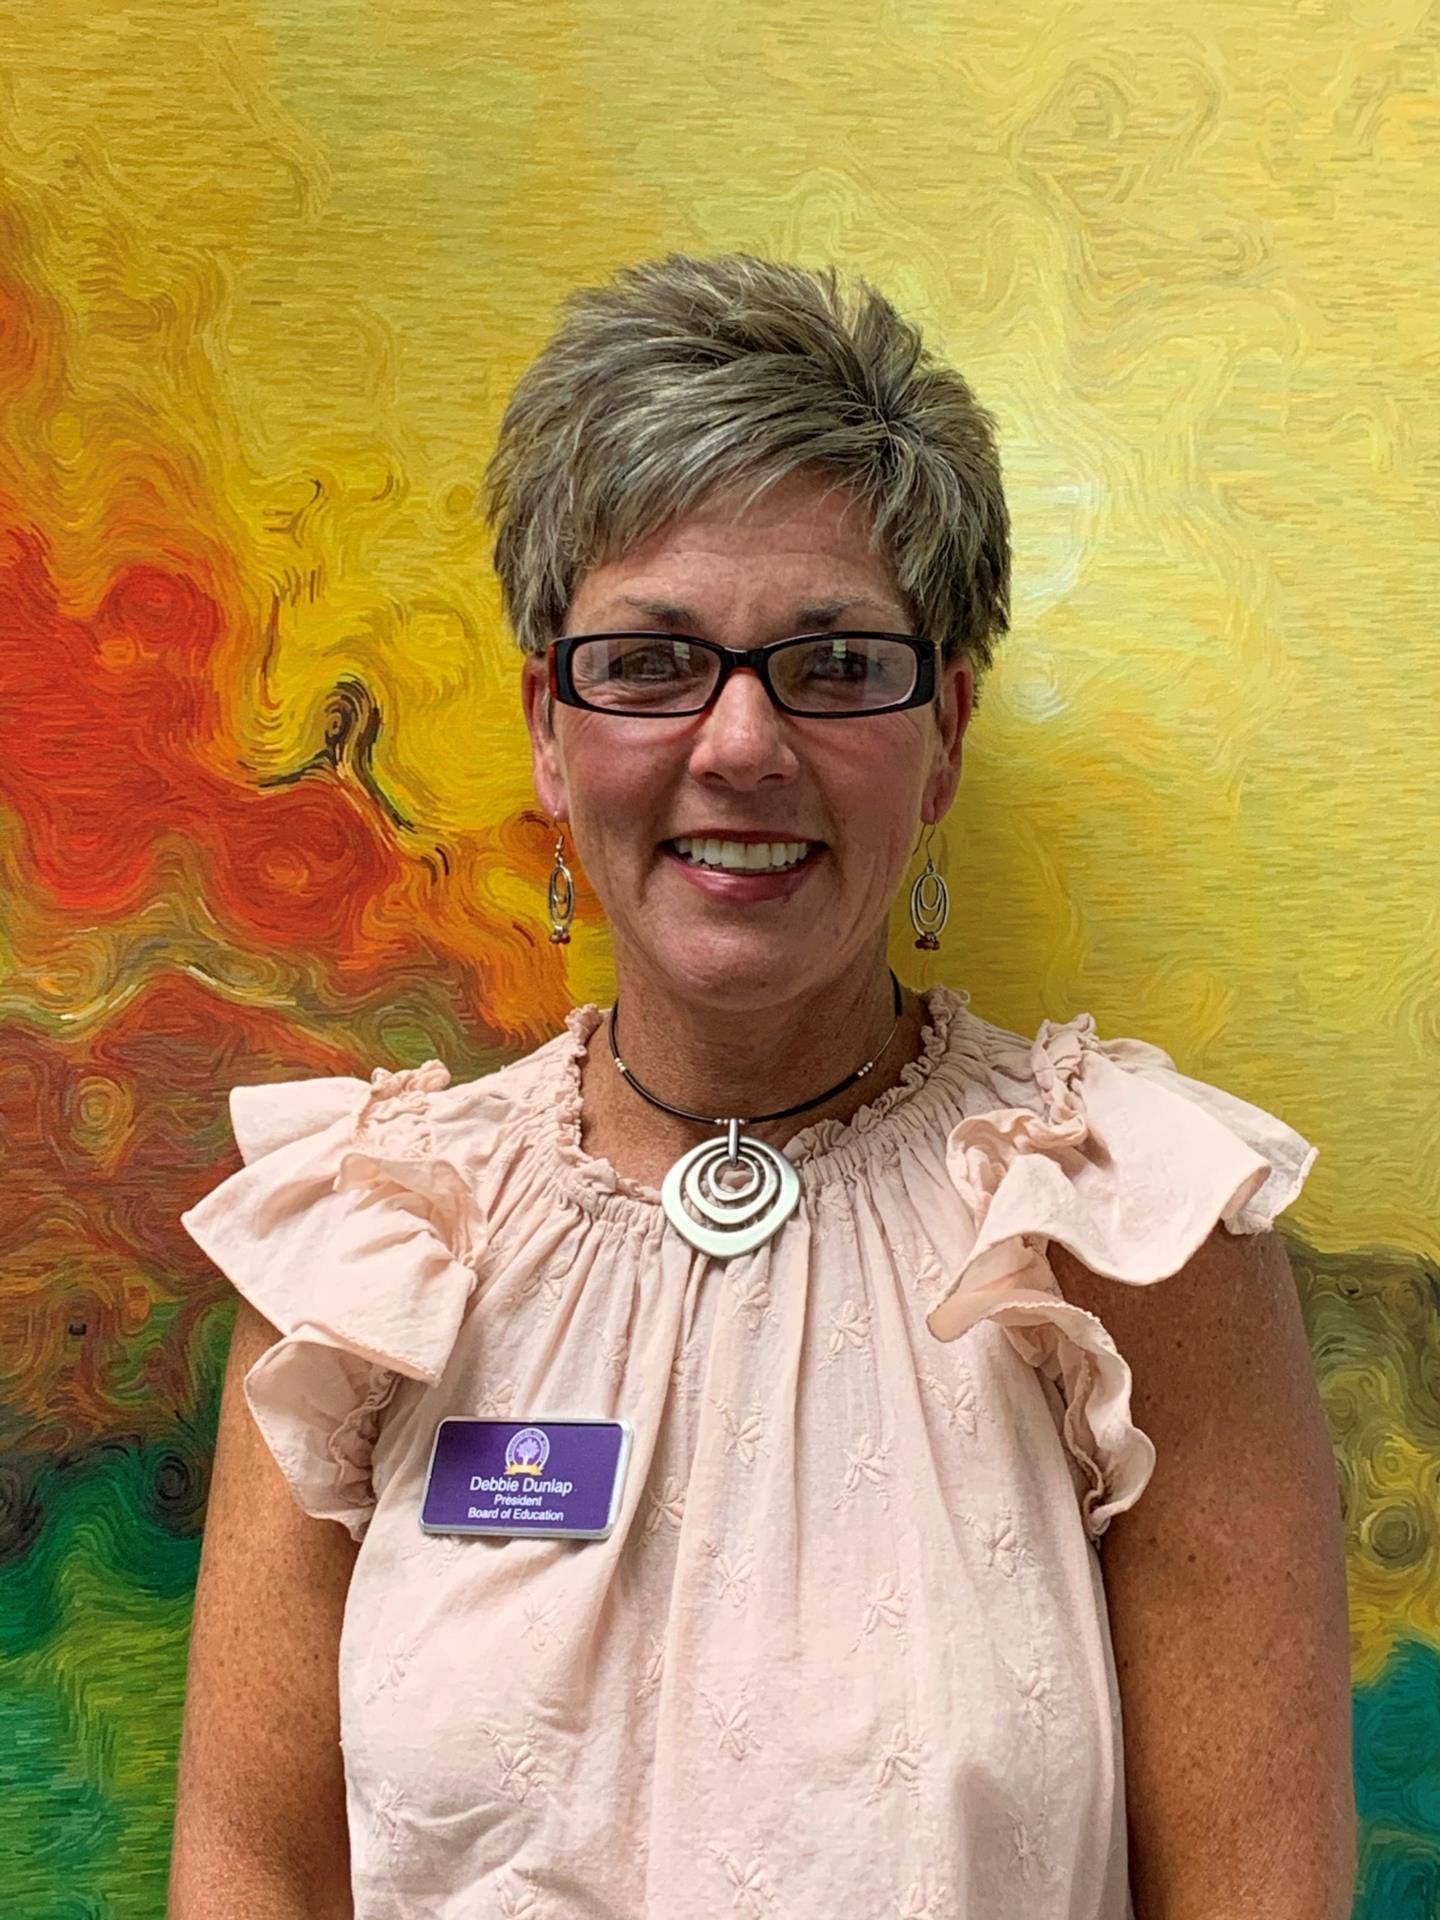 Debbie Dunlap